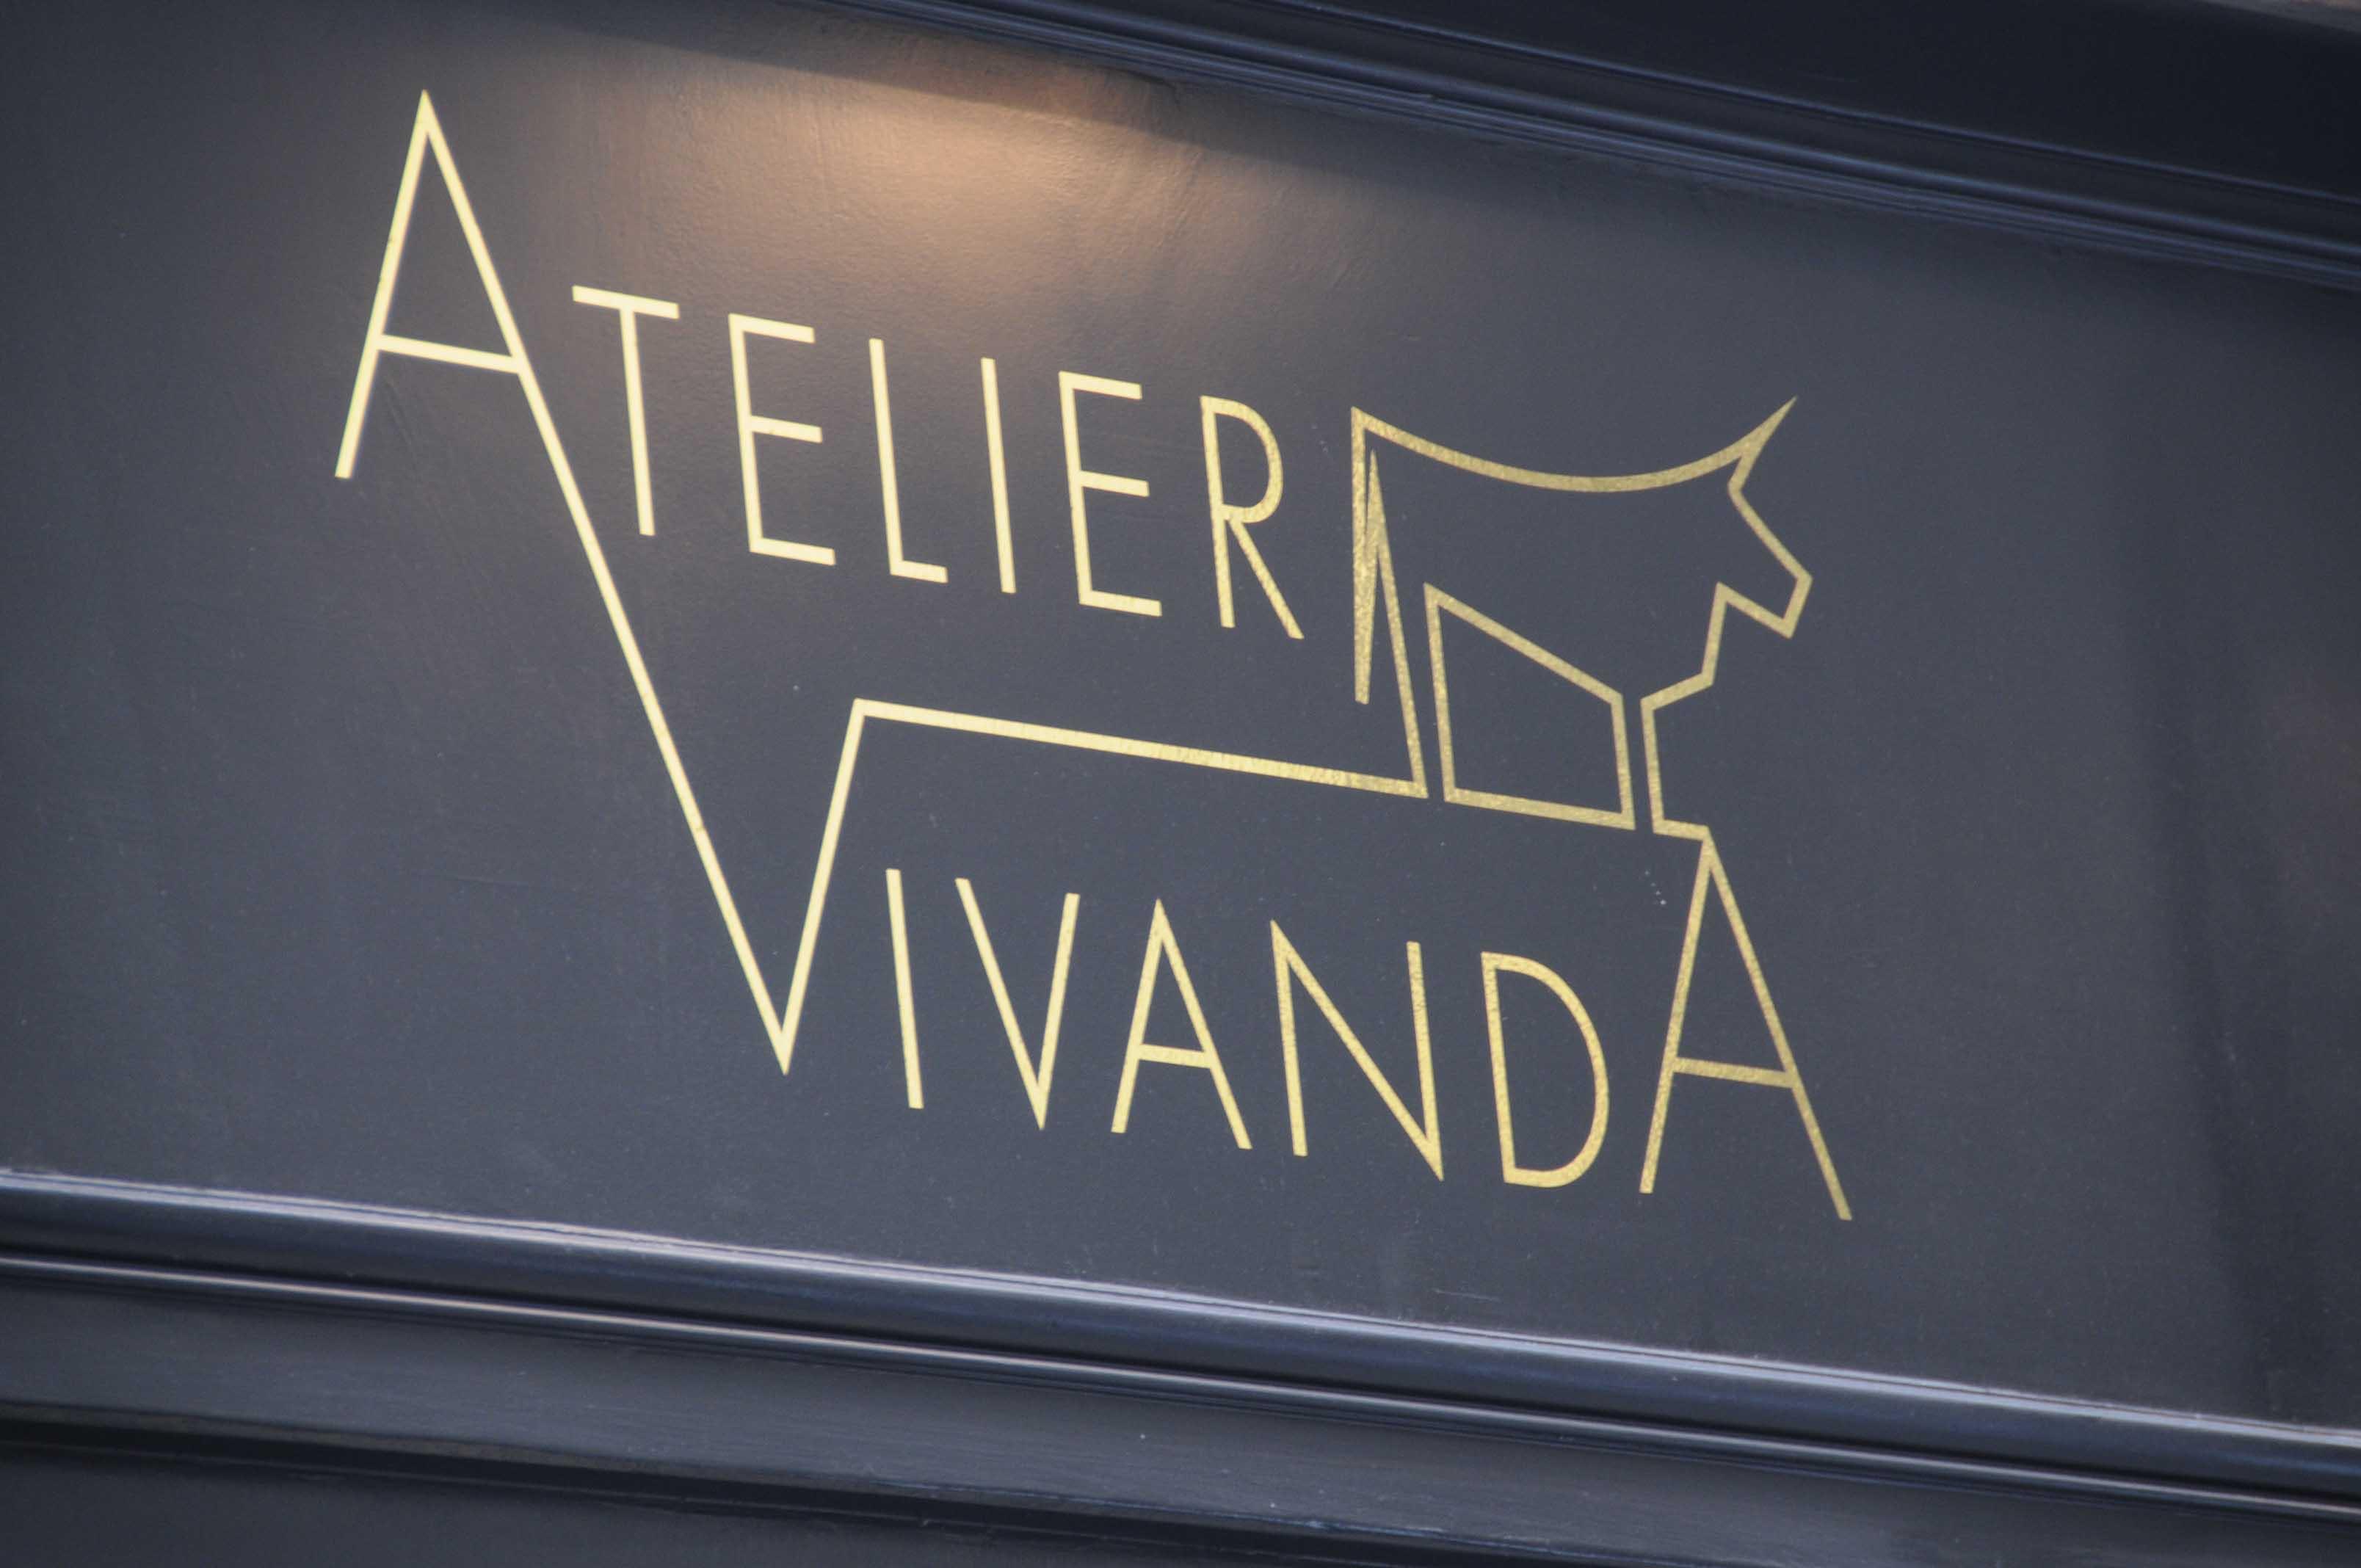 Atelier Vivanda - Paris